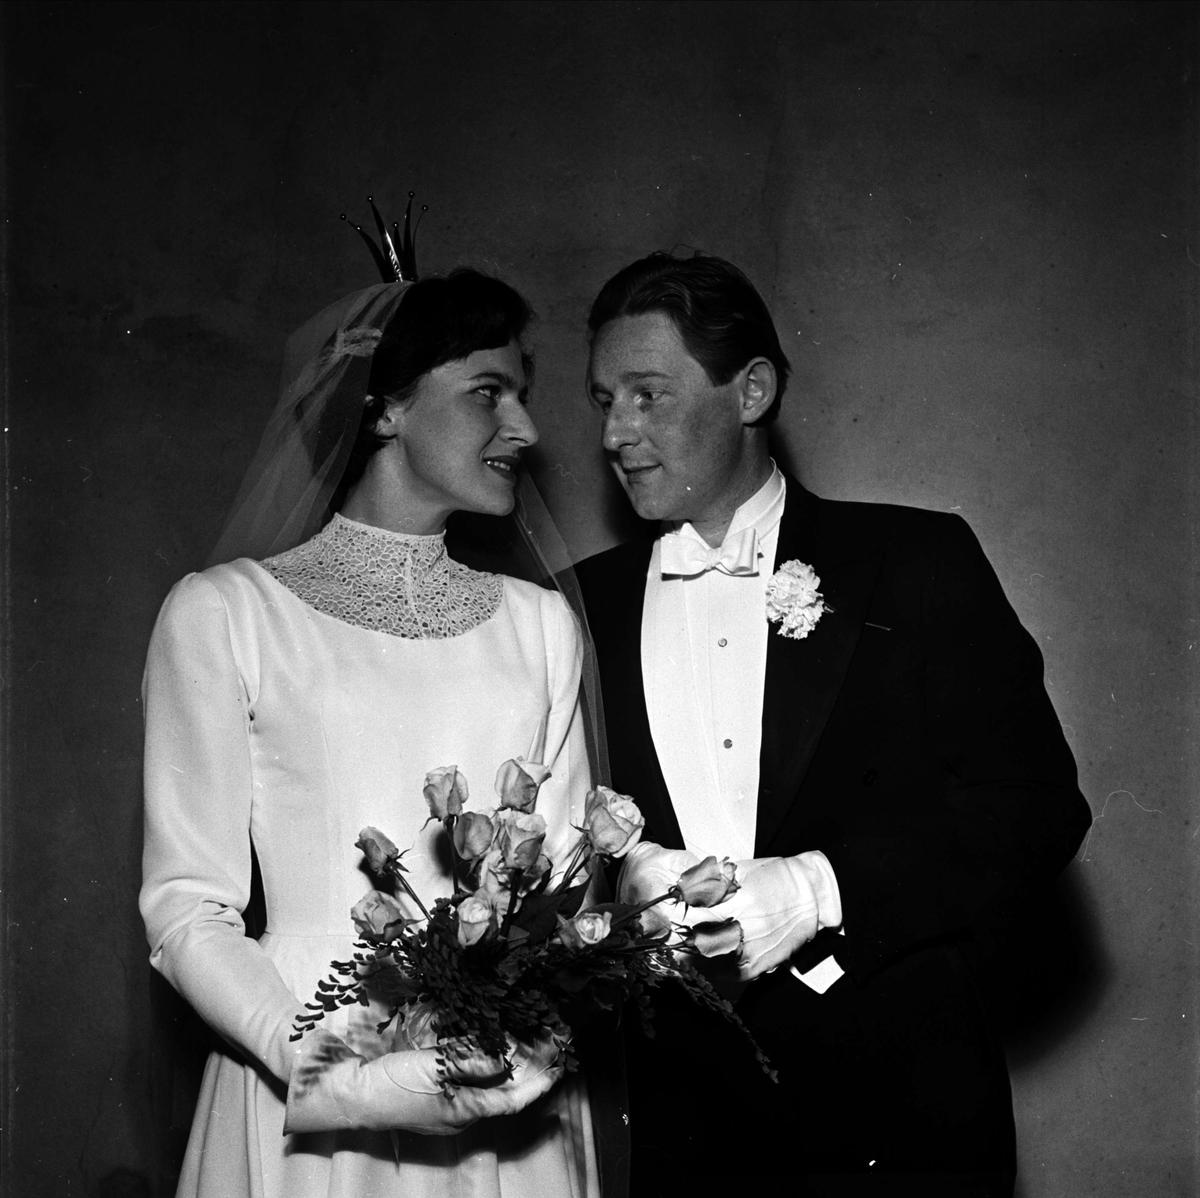 c842957a3e9e Bröllop - brudparet Knutsson - Leshman i Helga Trefaldighets kyrka, Uppsala  1955